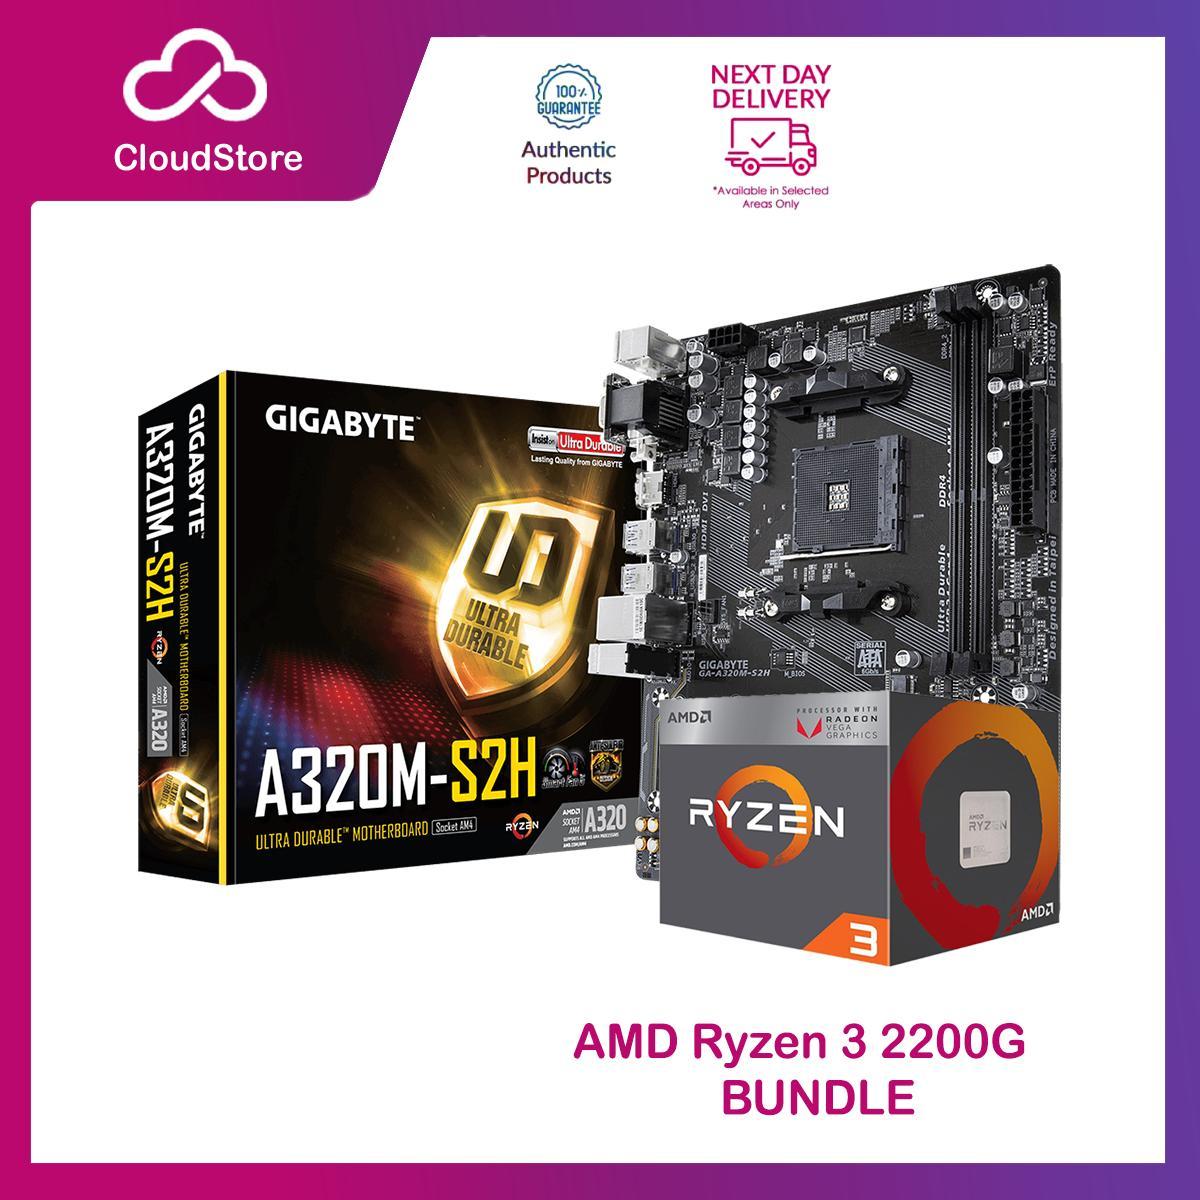 87c15b3581d4 Amd Ryzen 3 2200G Processor Socket Am4 3.5ghz with Radeon Vega 8, Ryzen3 2nd